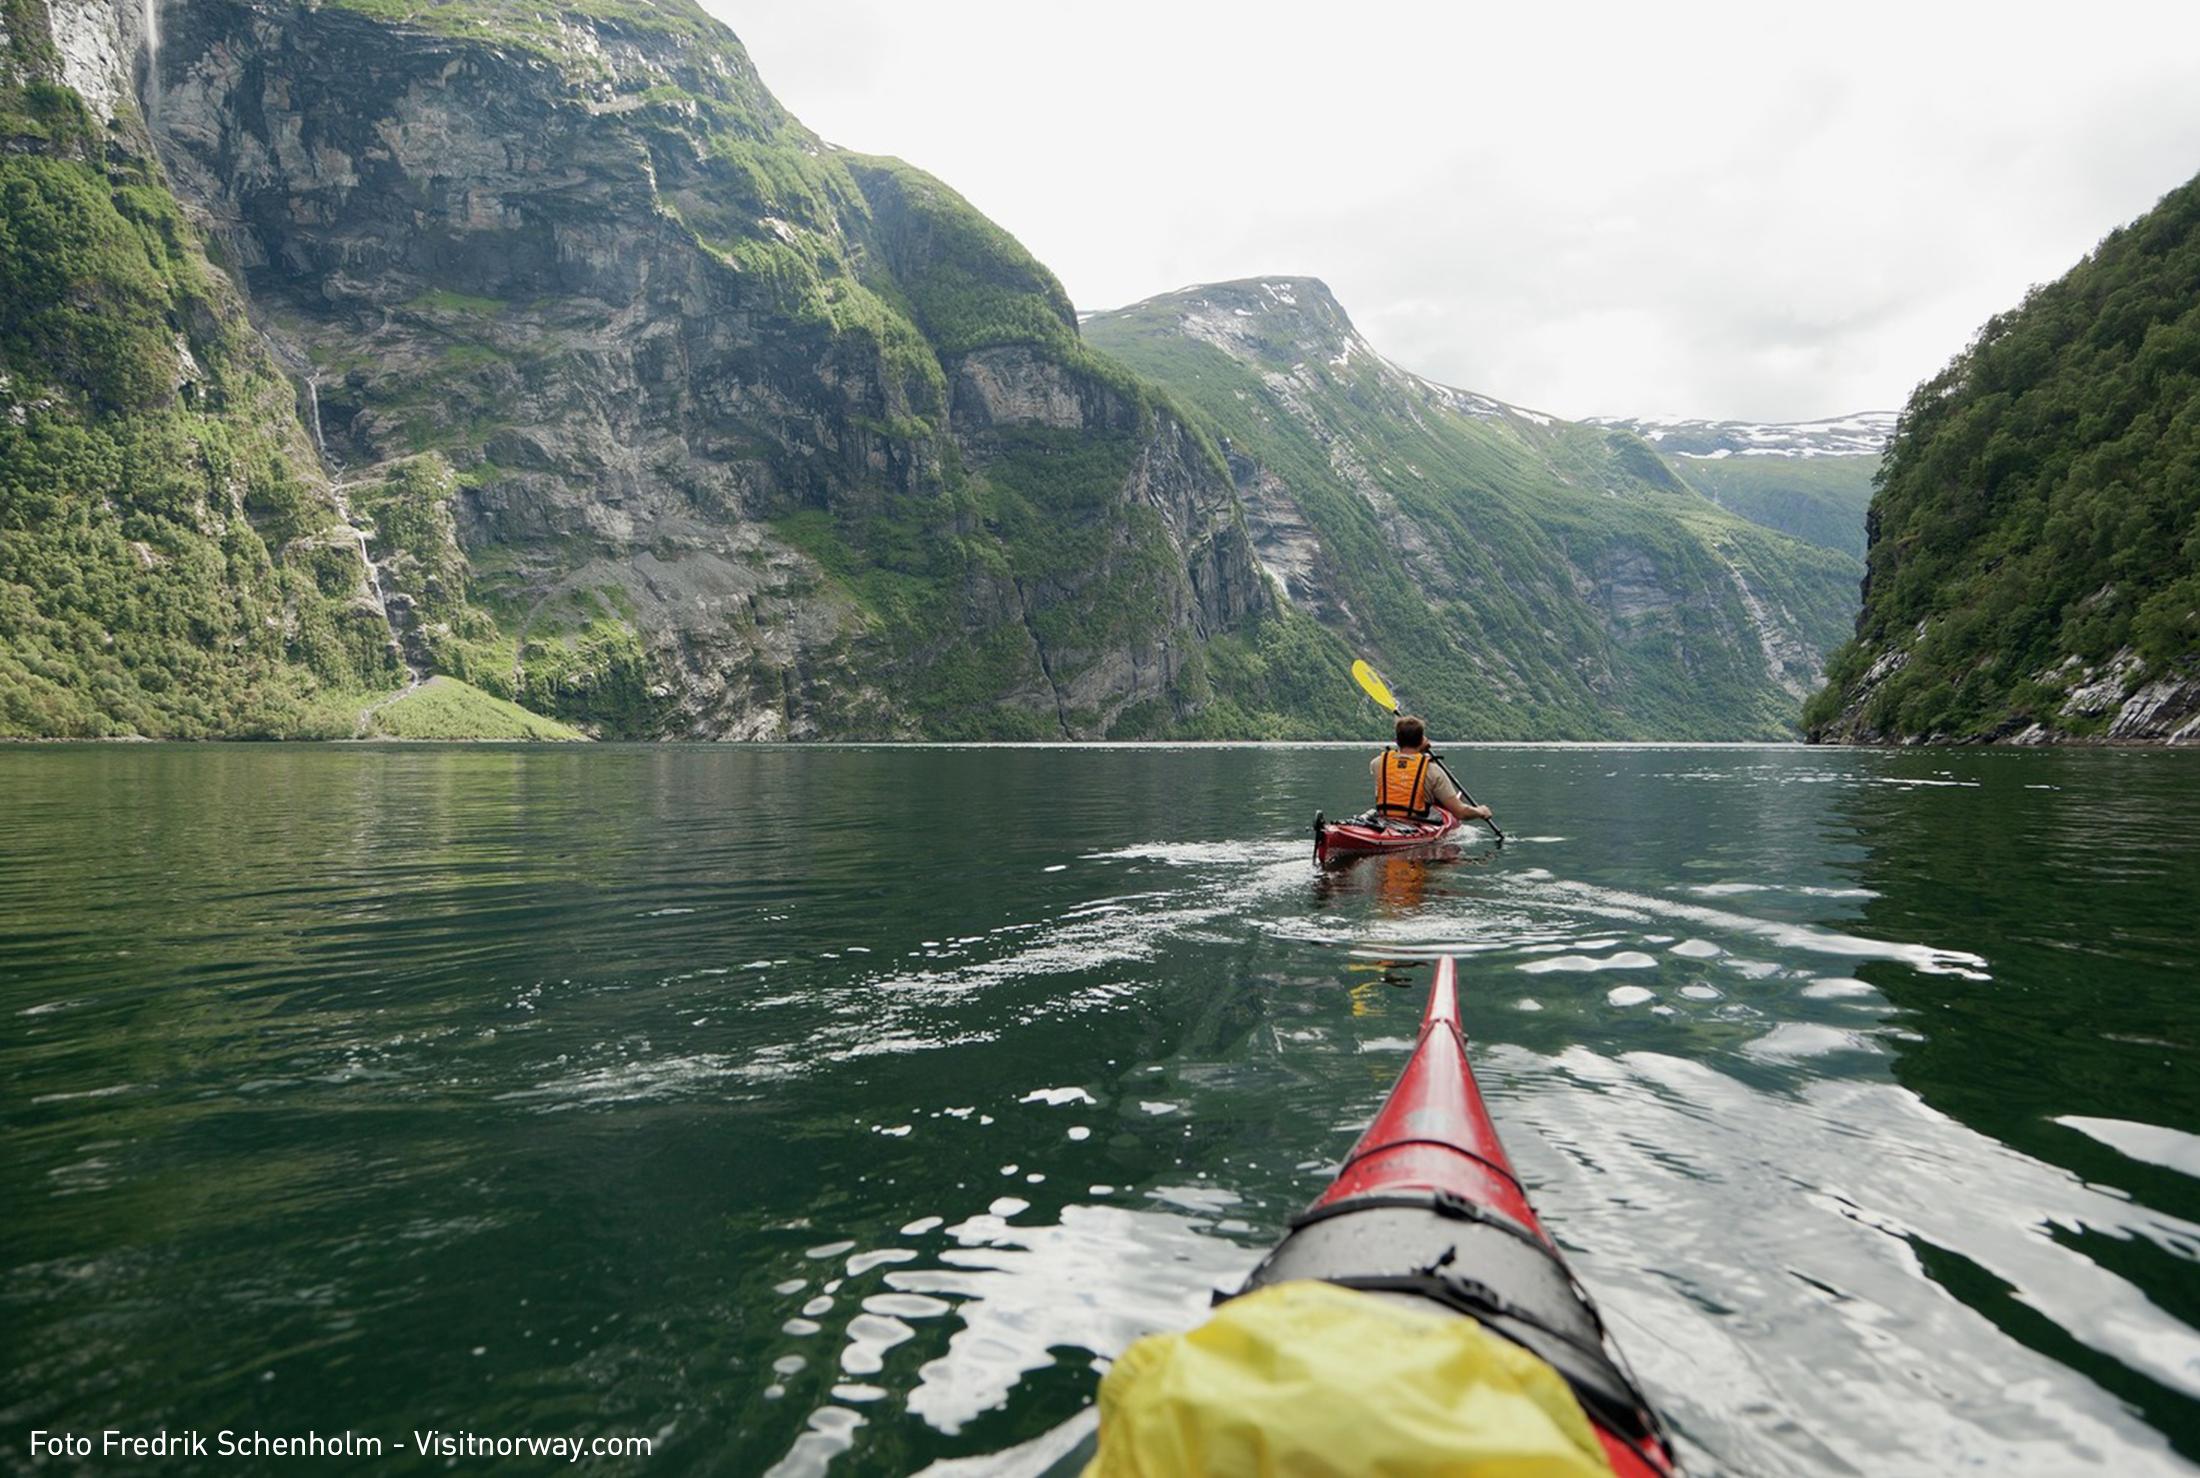 Kajakk i Geirangerfjorden Foto Fredrik Schenholm.png